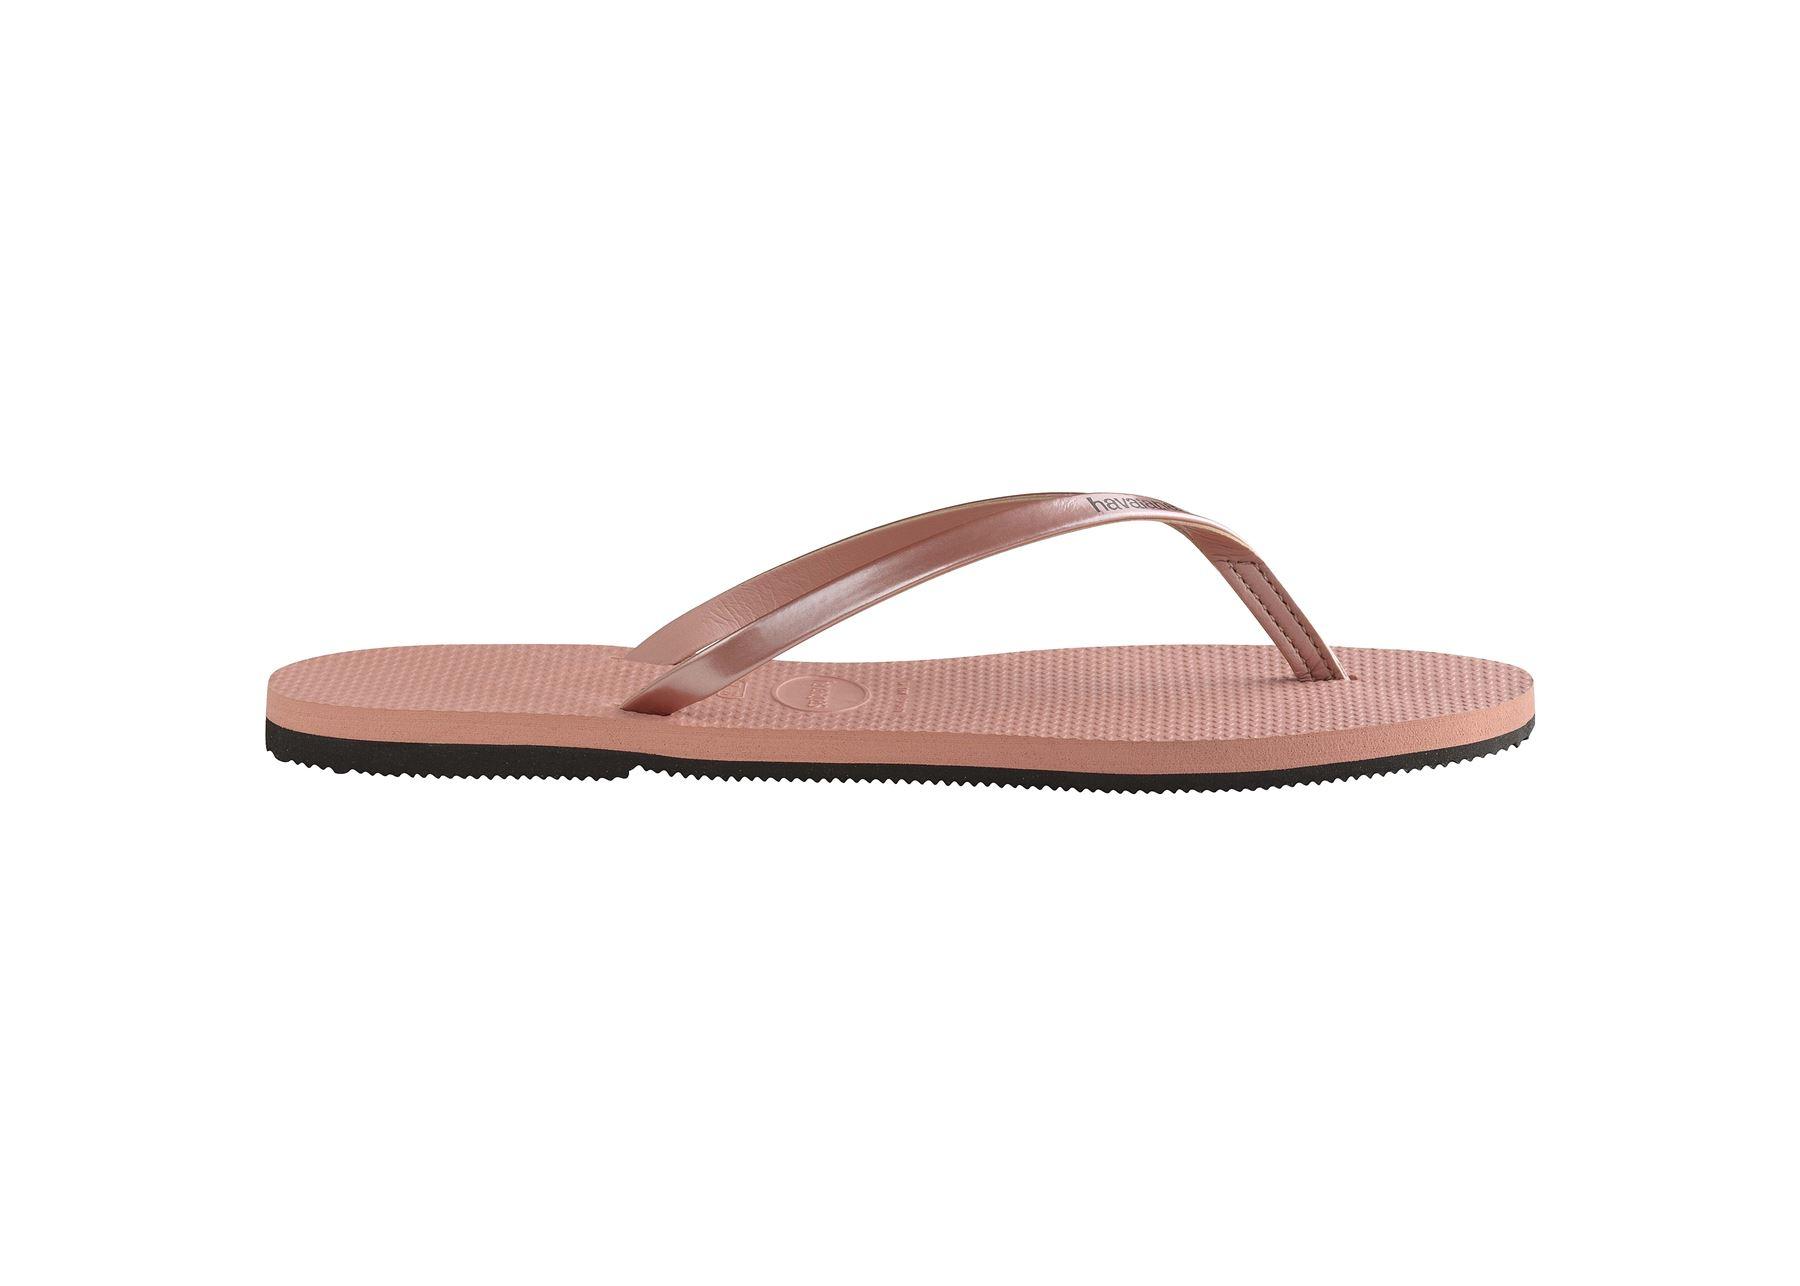 Havaianas-You-Metallic-Flip-Flops-Women-Summer-Beach-Sandals-Wide-Range-Colours miniature 7